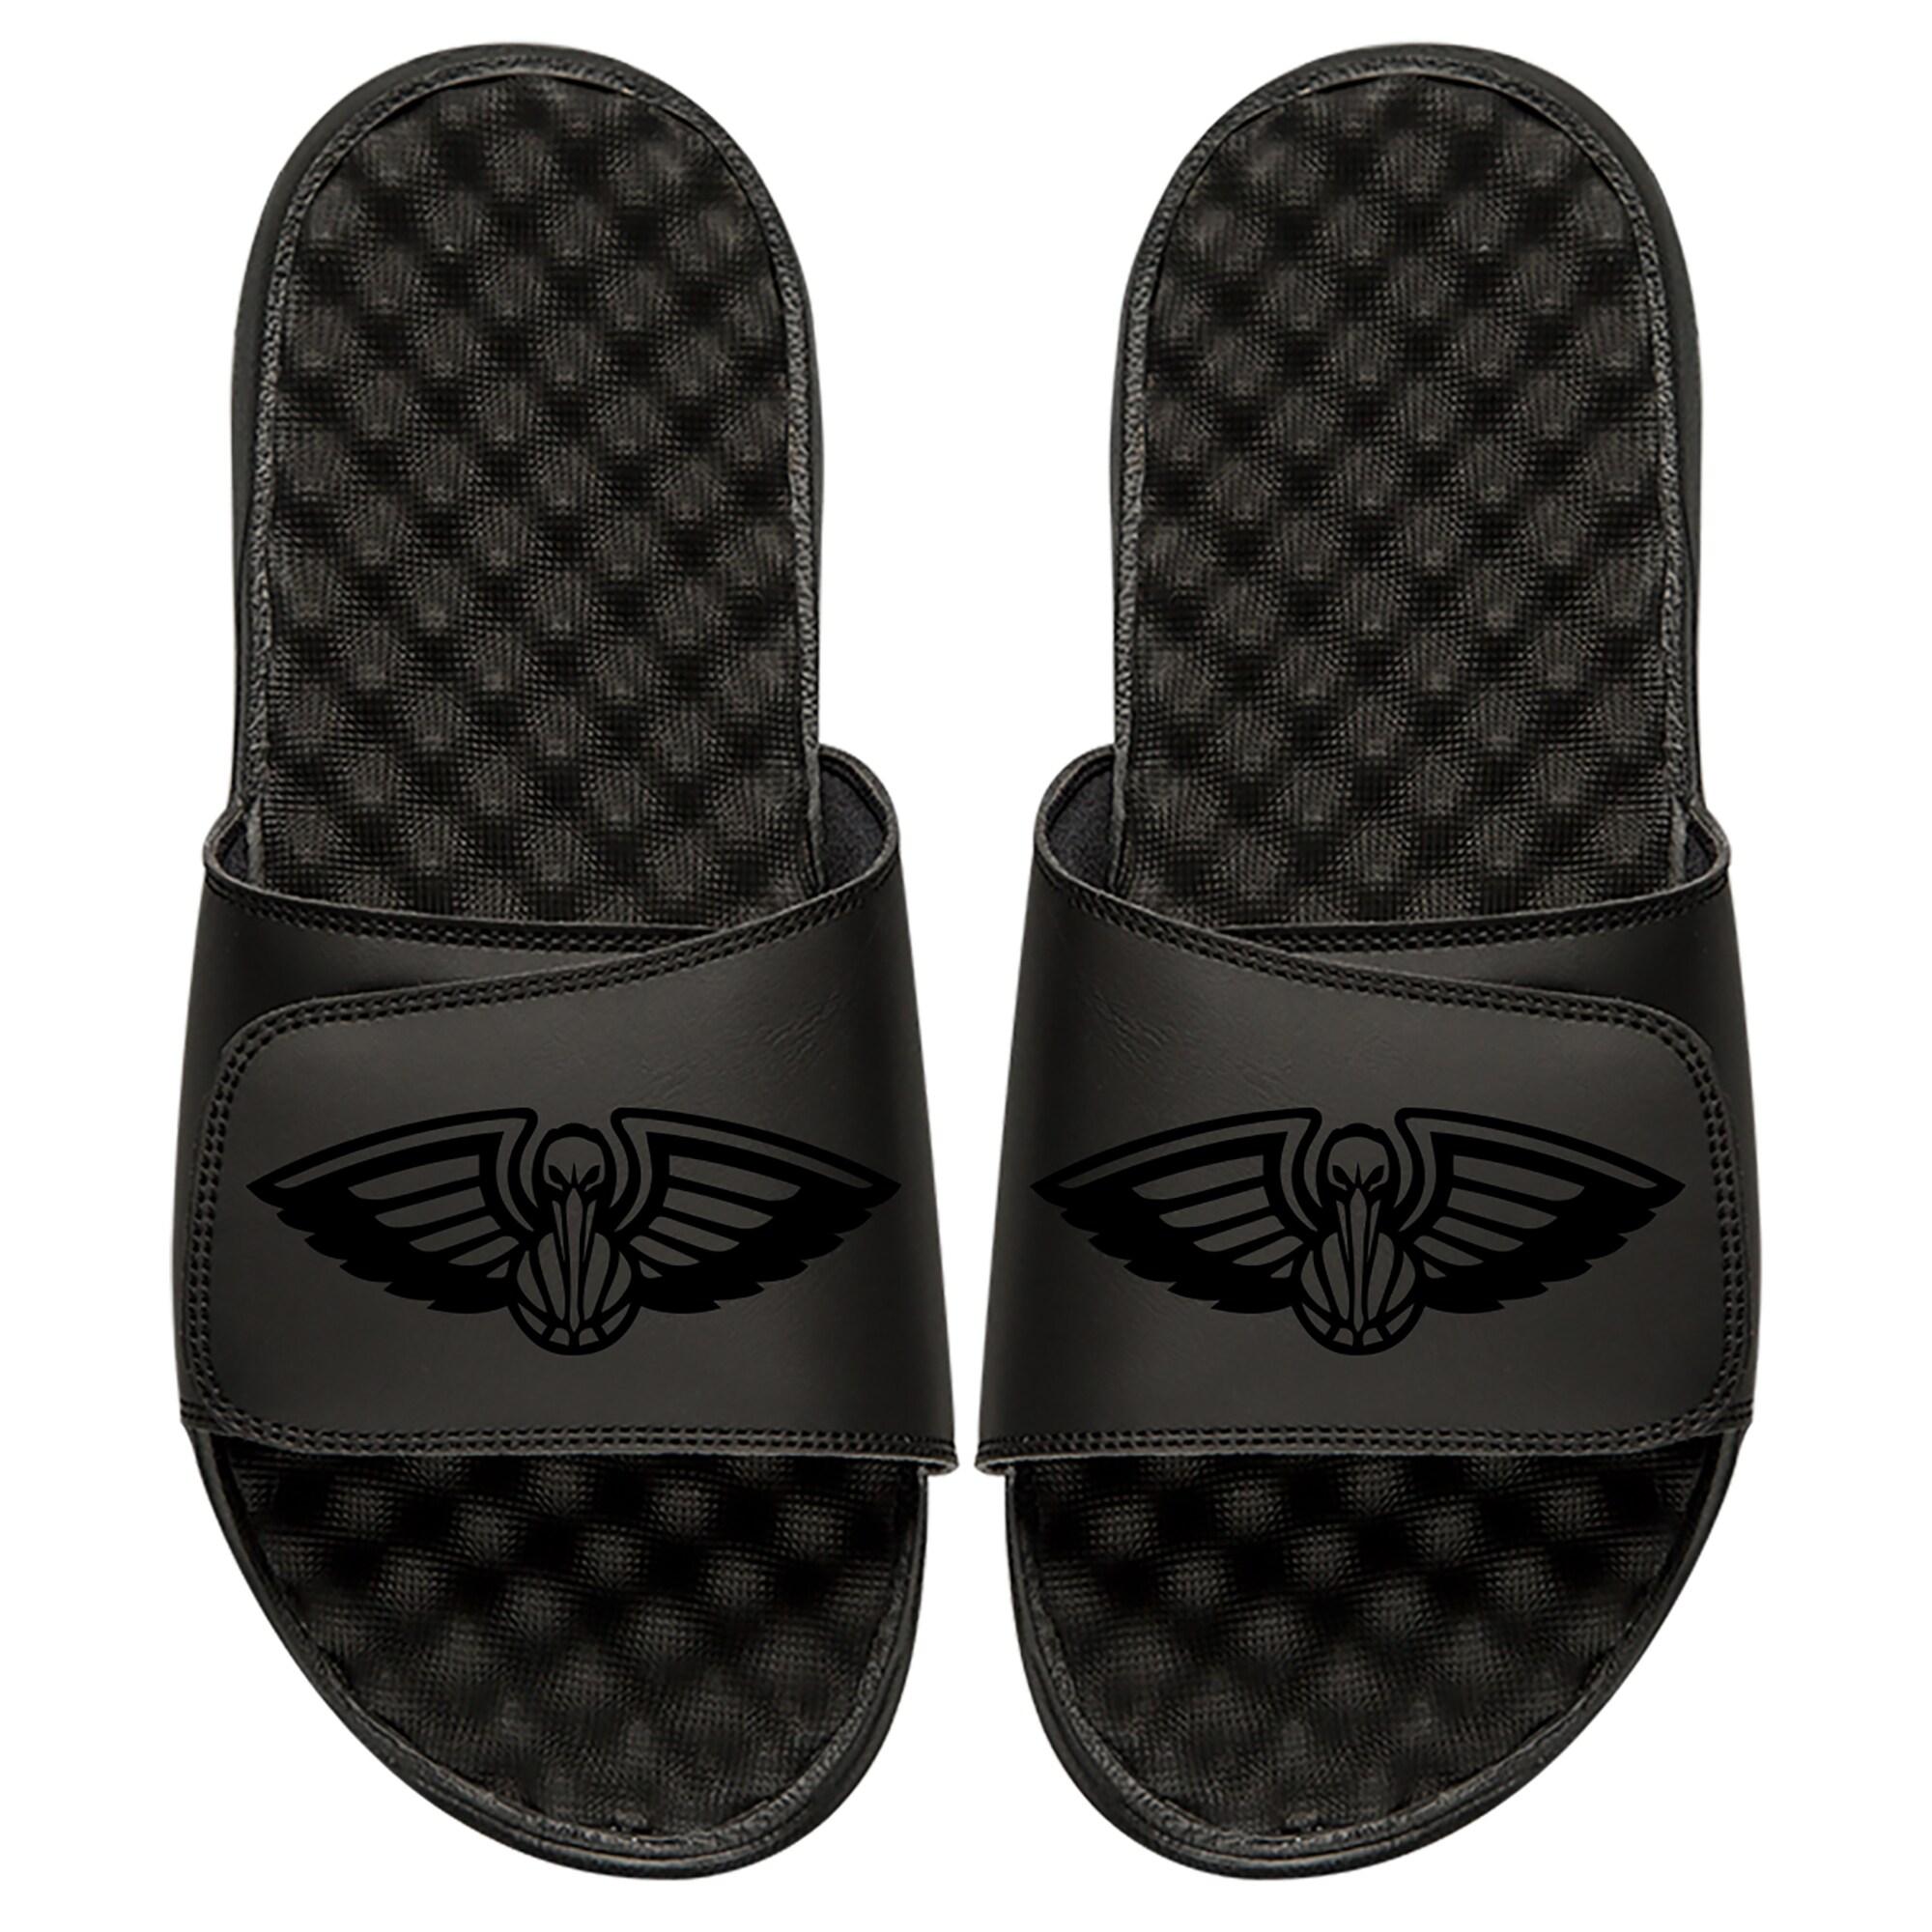 New Orleans Pelicans ISlide Tonal Slide Sandals - Black